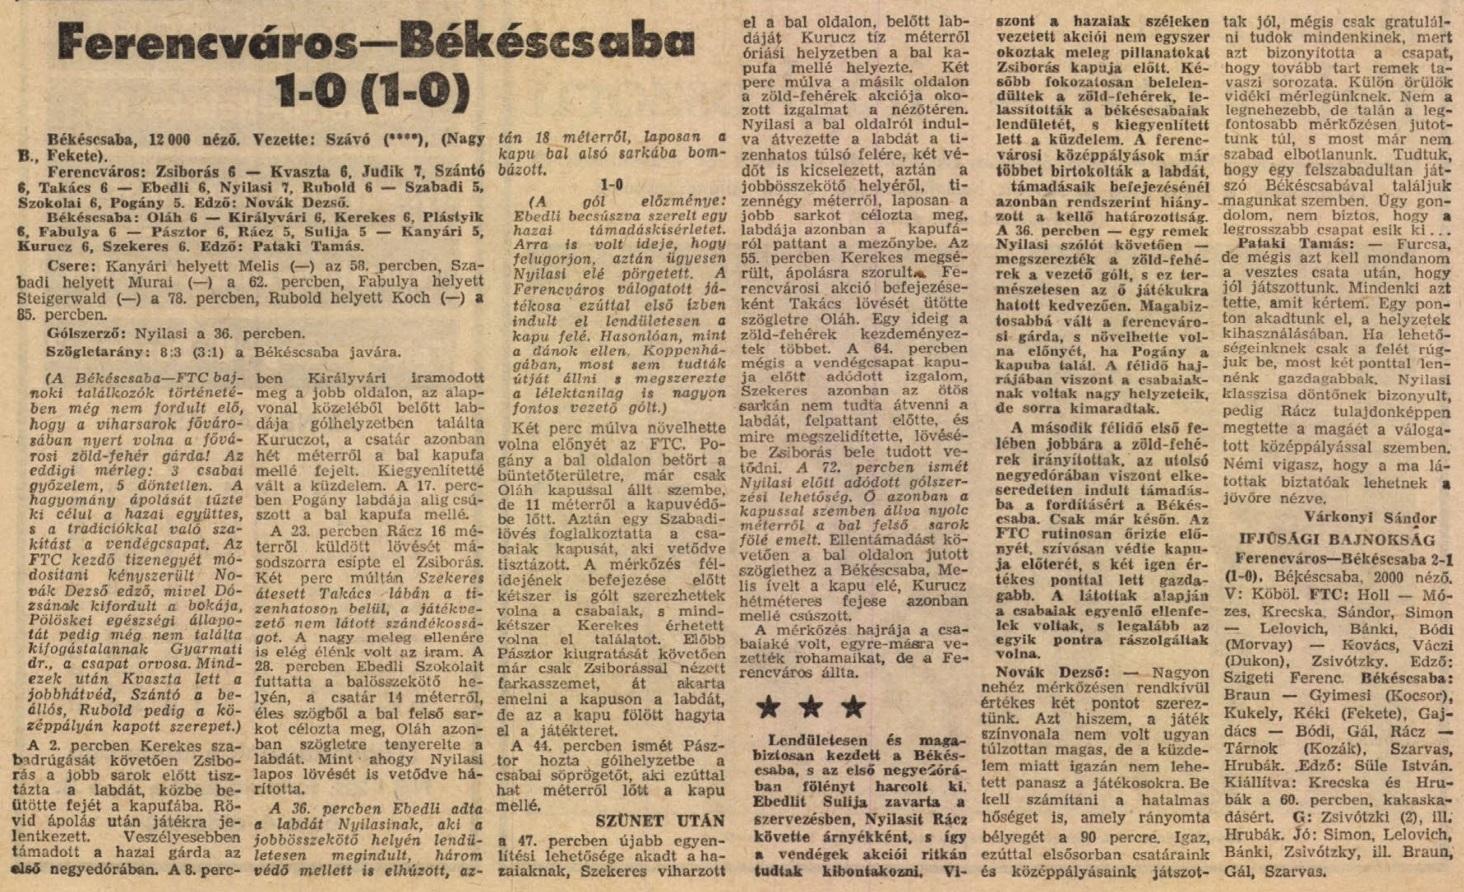 idokapszula_nb_i_1982_83_28_fordulo_bekescsaba_ferencvaros.jpg